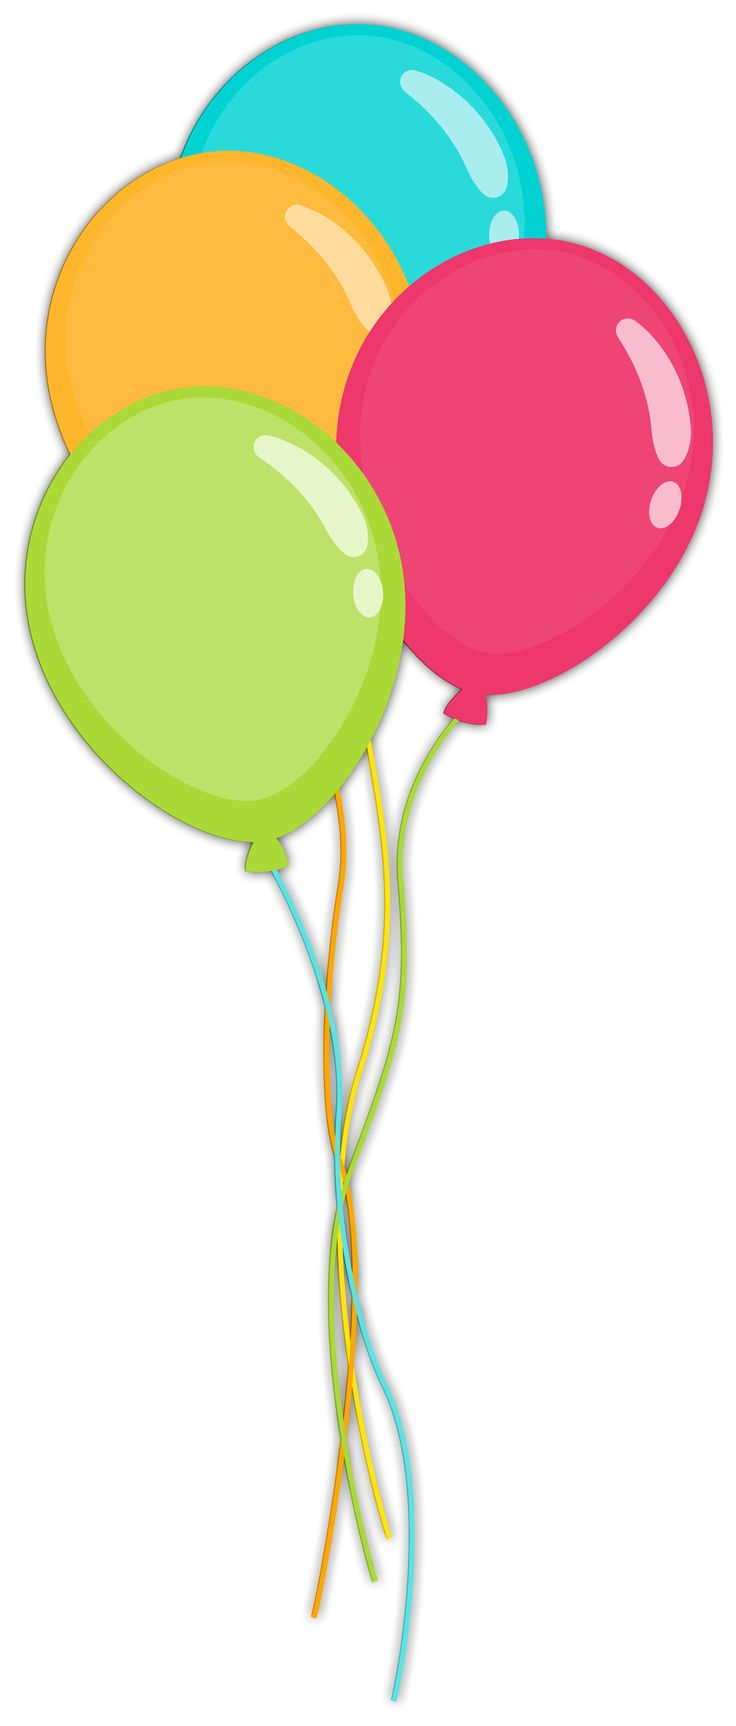 Balloon Clip Art.